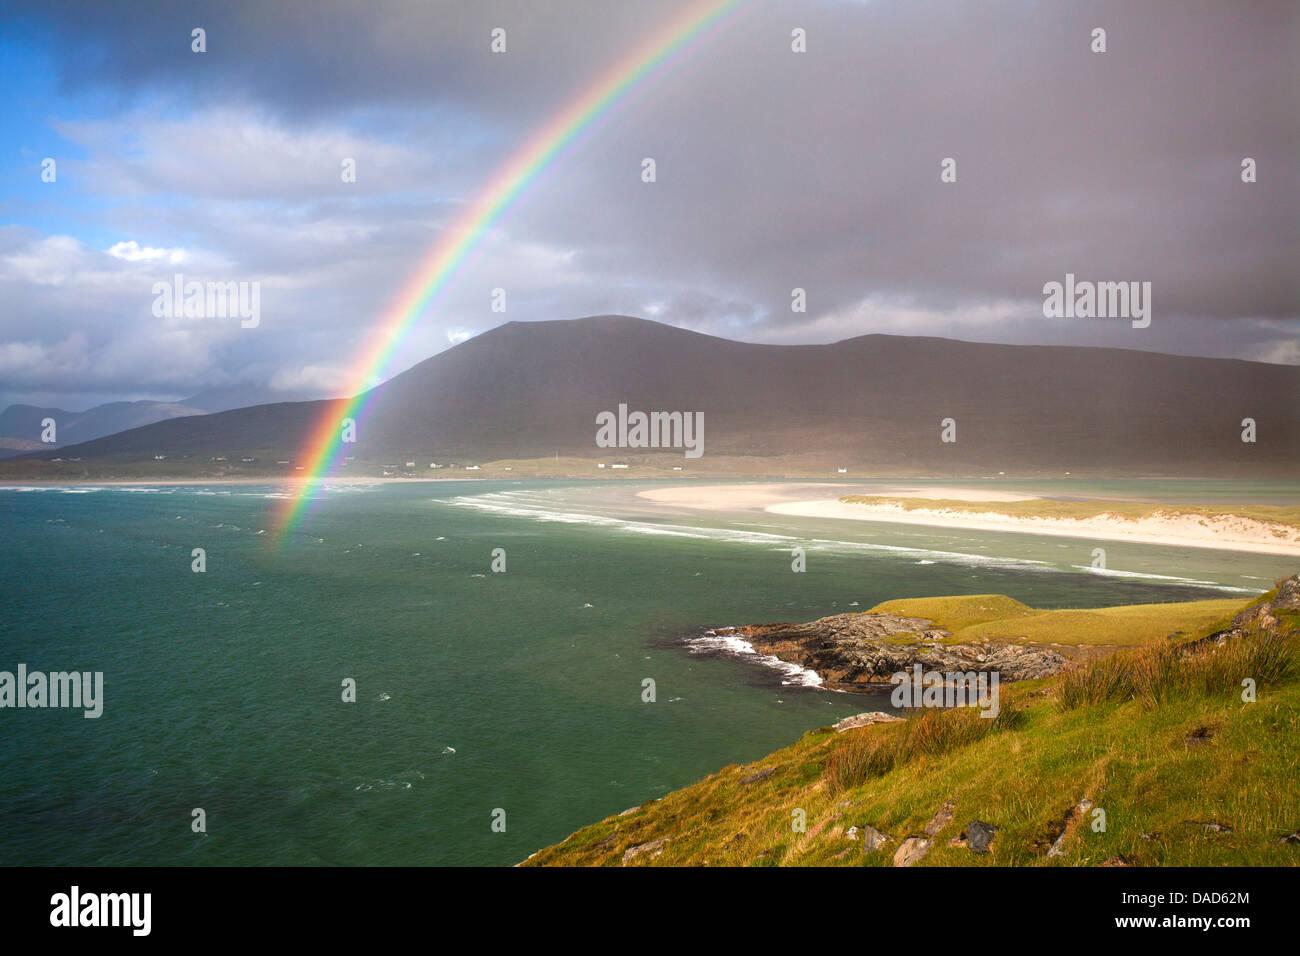 View across the beach at Seilebost towards Luskentyre, Seilebost, Isle of Harris, Outer Hebrides, Scotland, UK - Stock Image